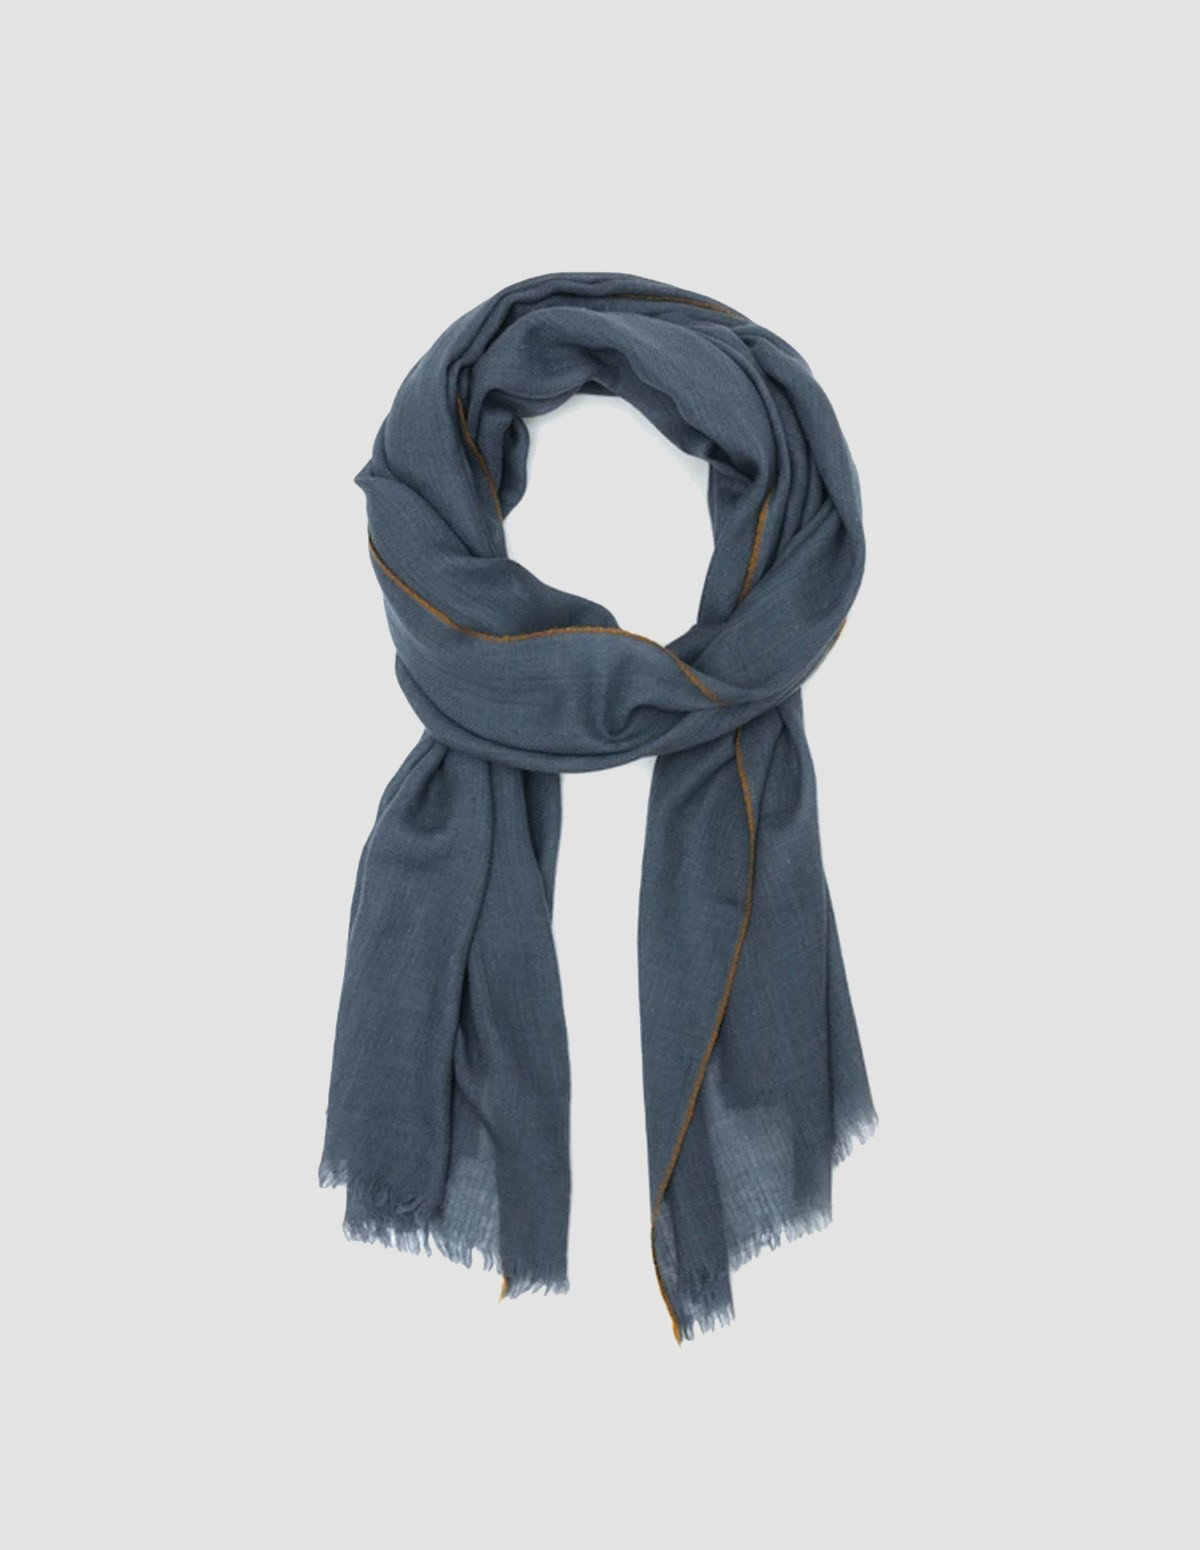 Moismont 558 Foulard - DUTCH BLUE